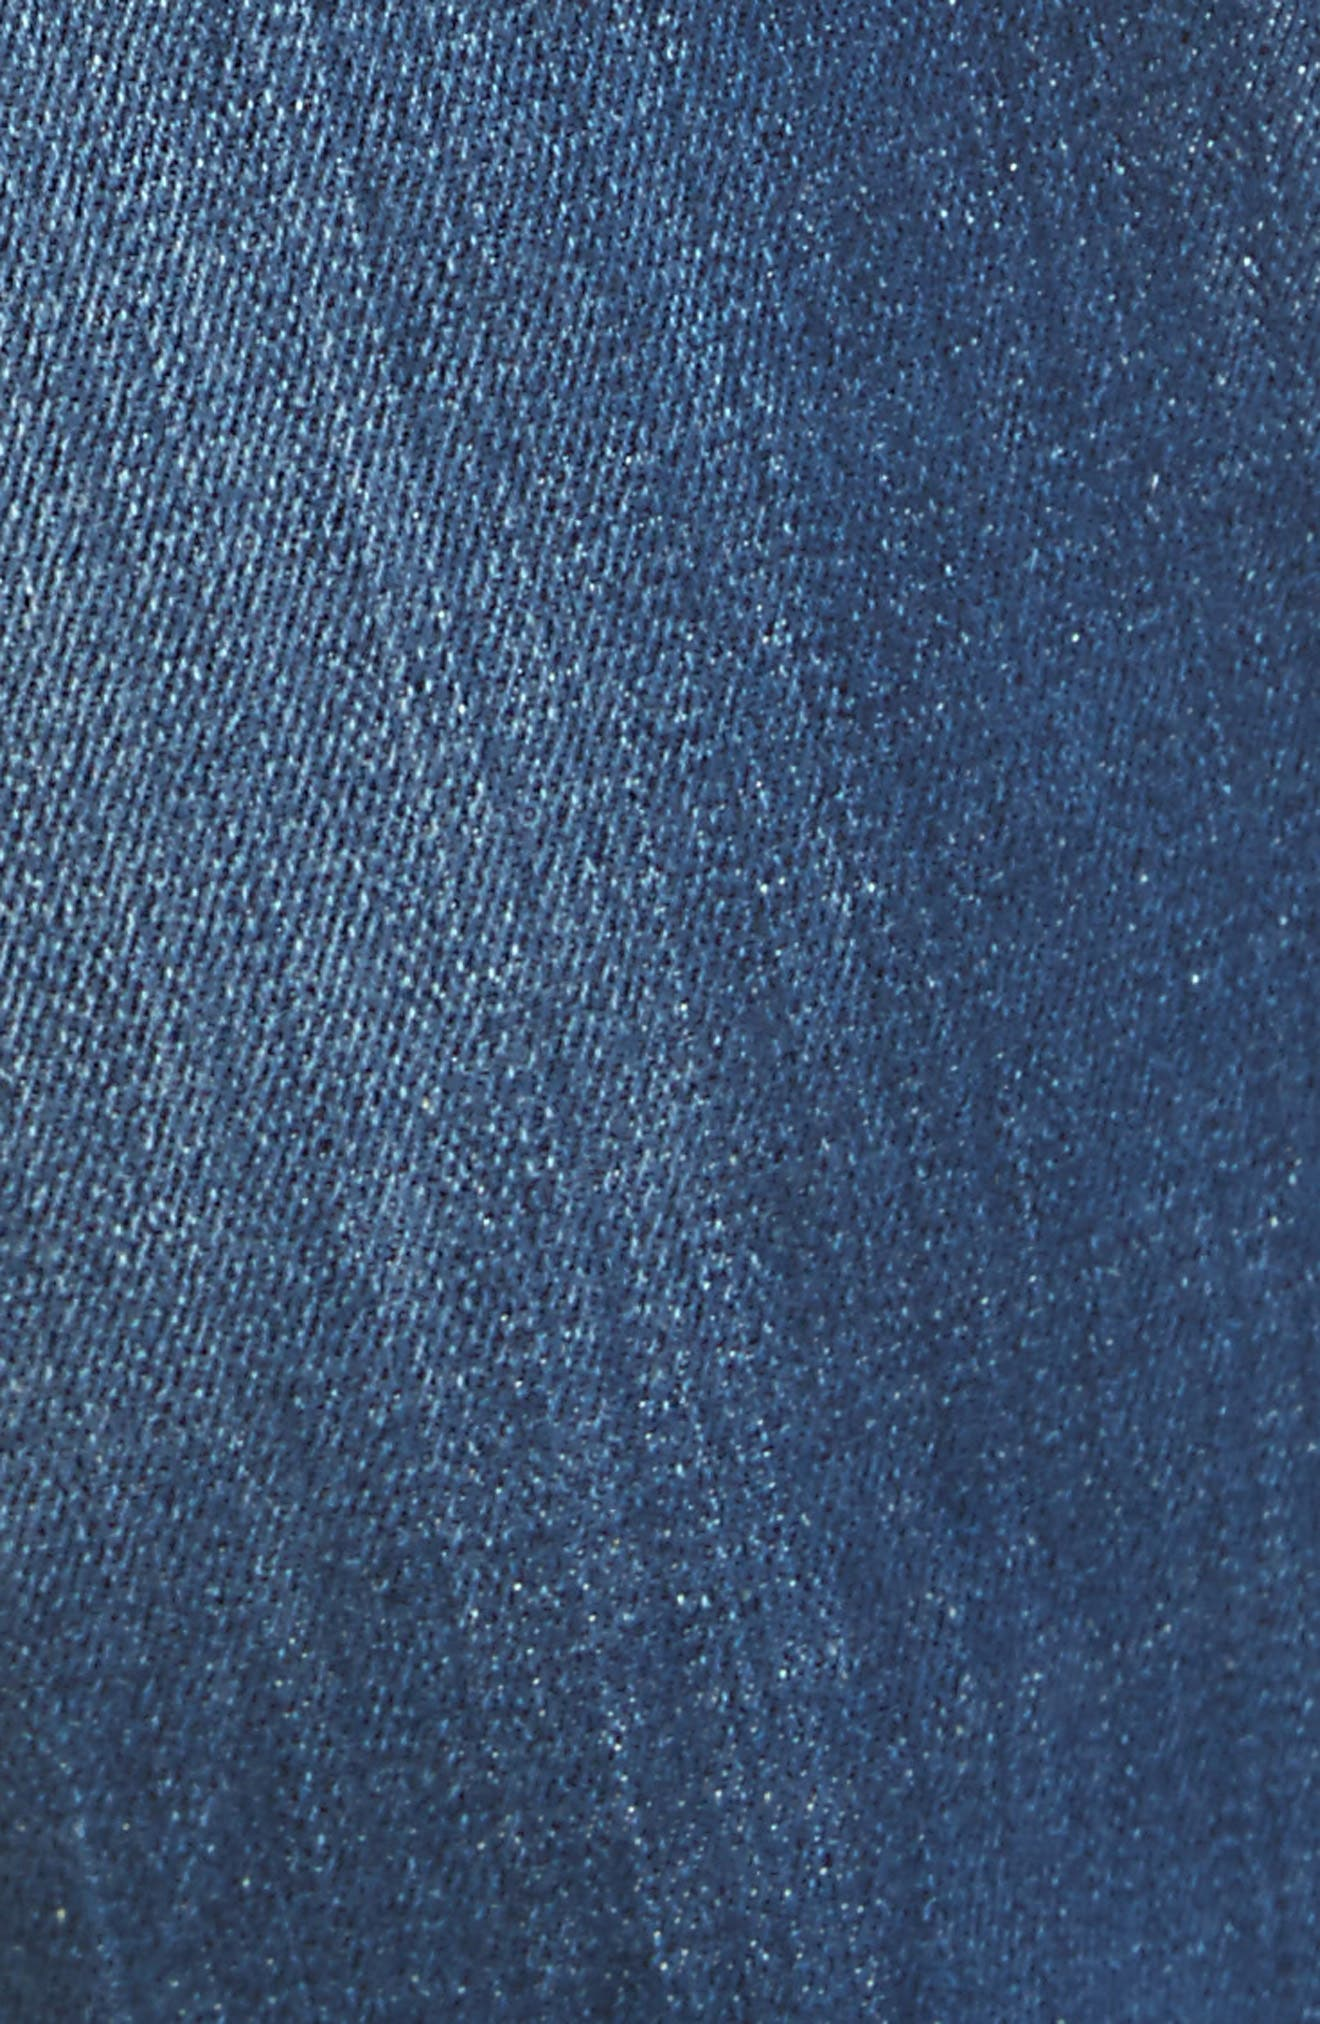 Slim Fit Medium Wash Jeans,                             Alternate thumbnail 5, color,                             Navy/Blue